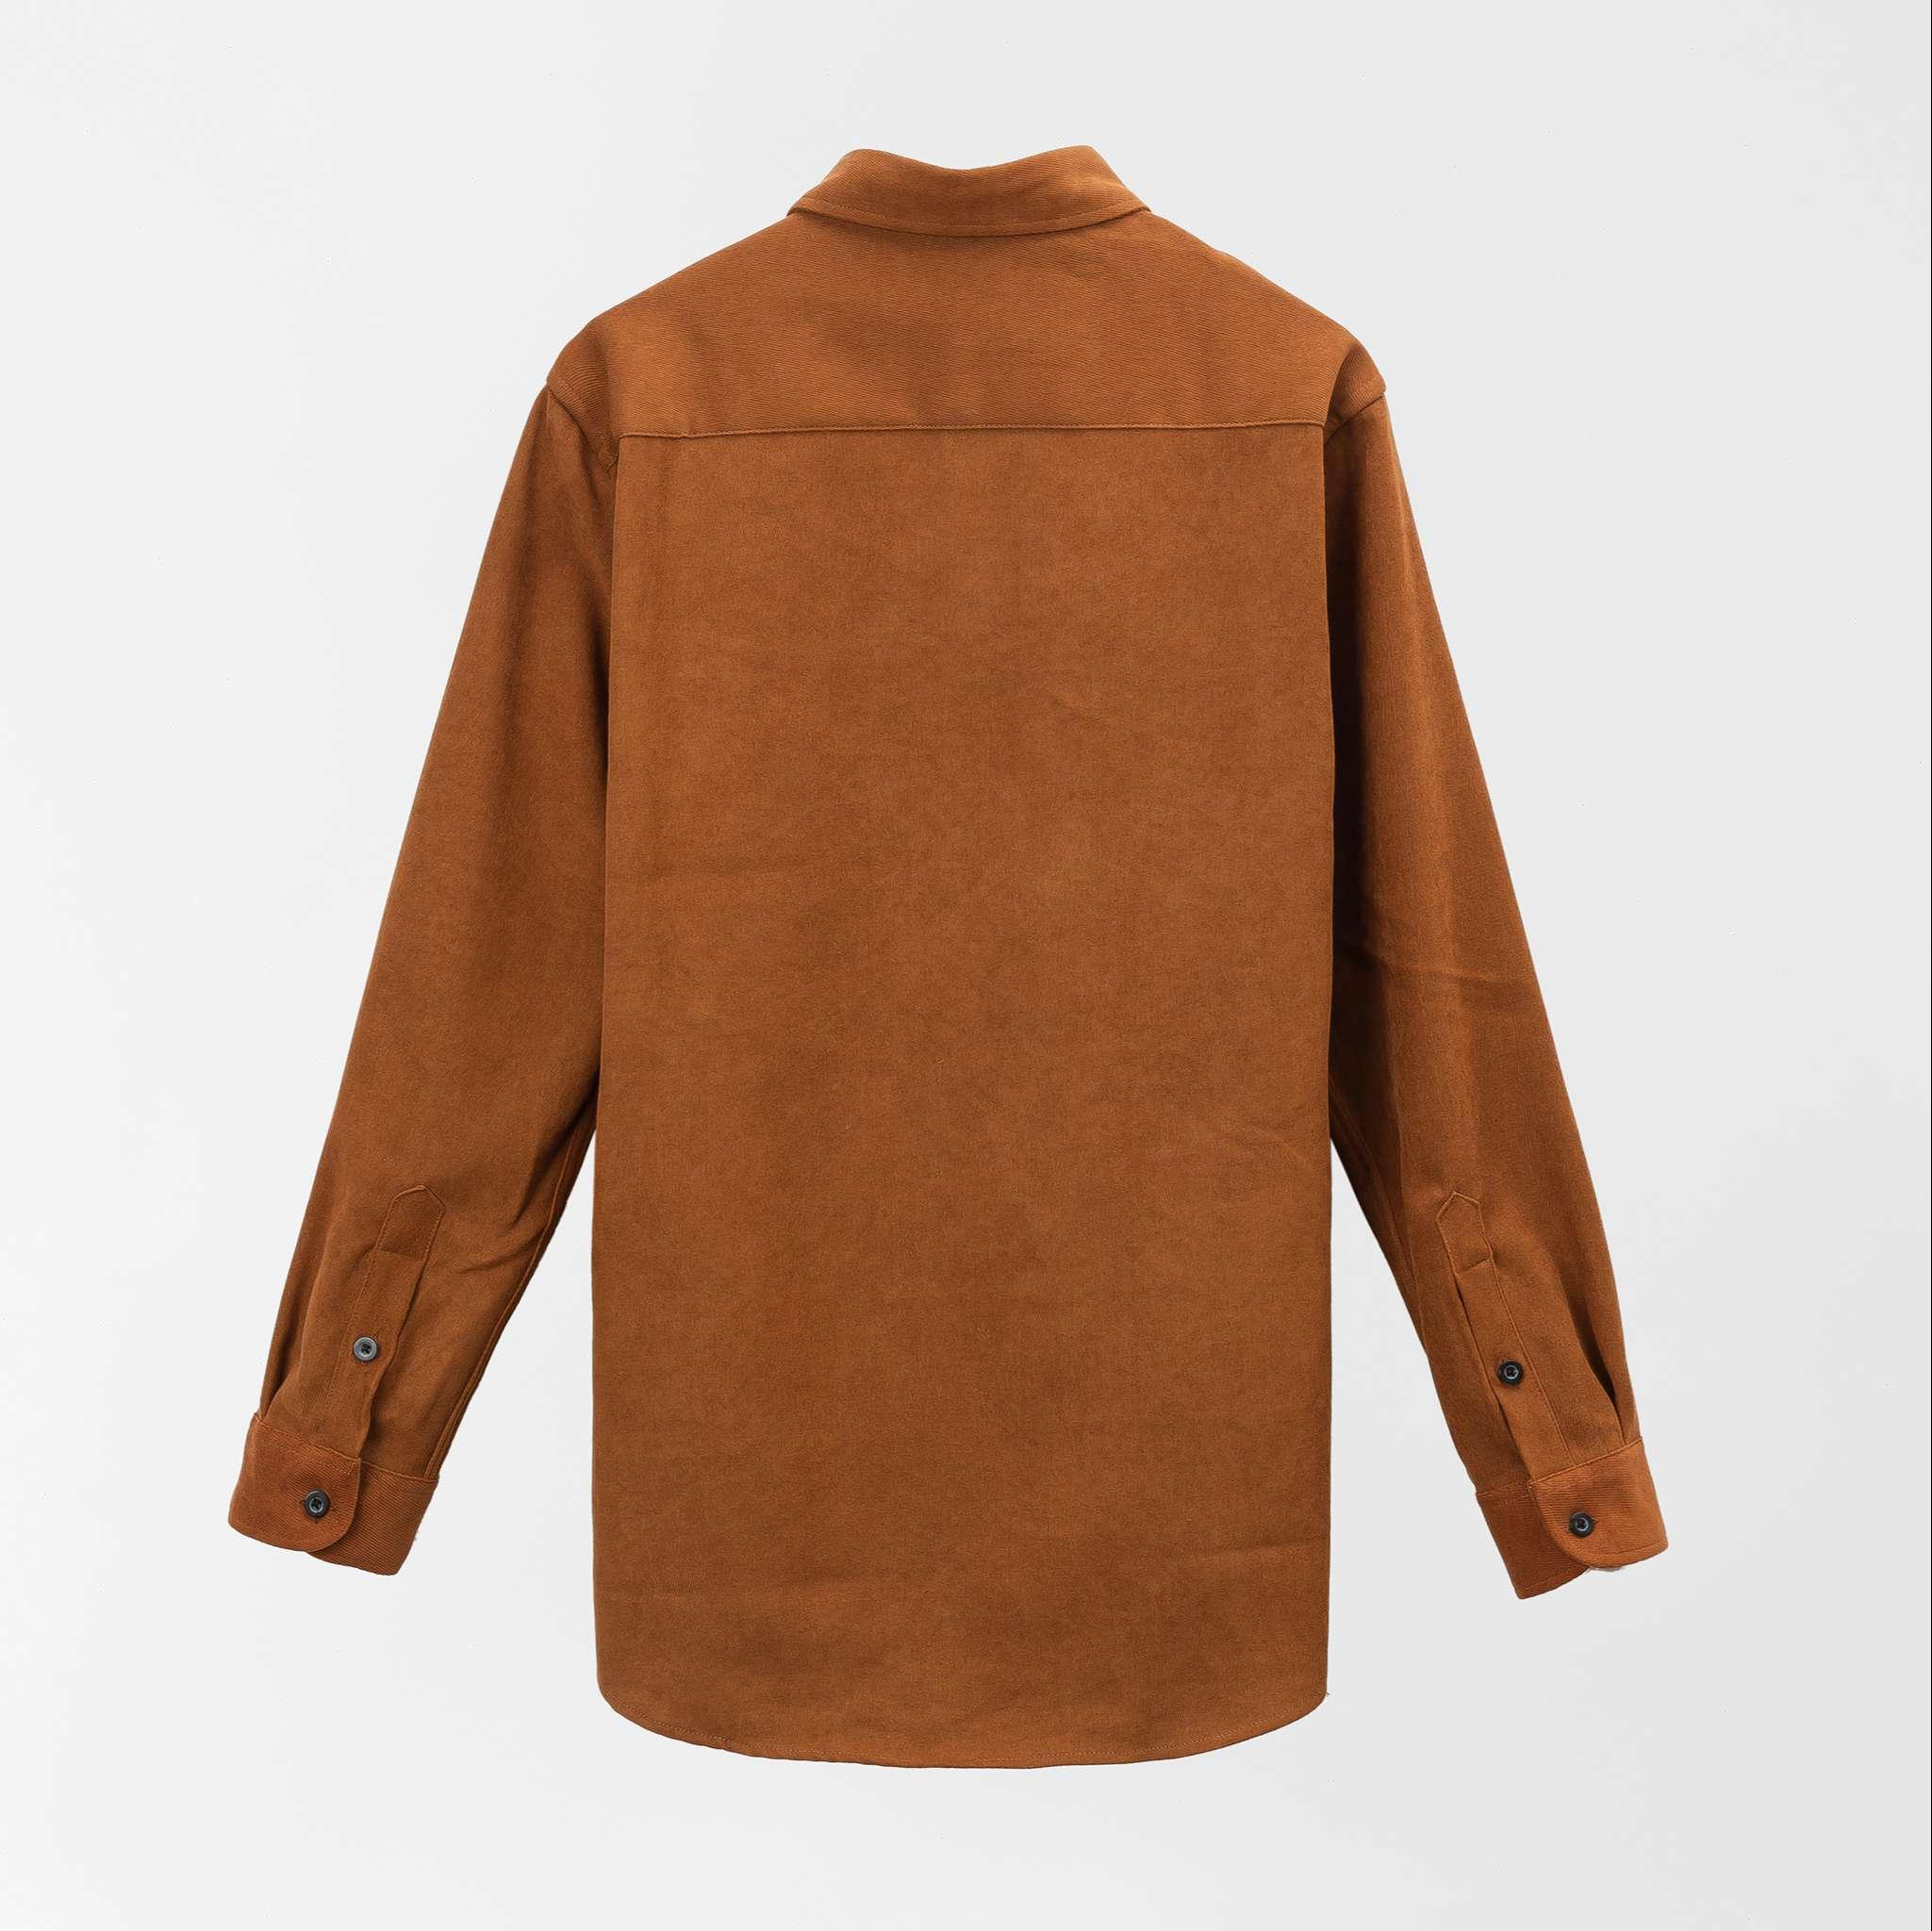 SP267 - Áo Sơ Mi Velvet Fabric